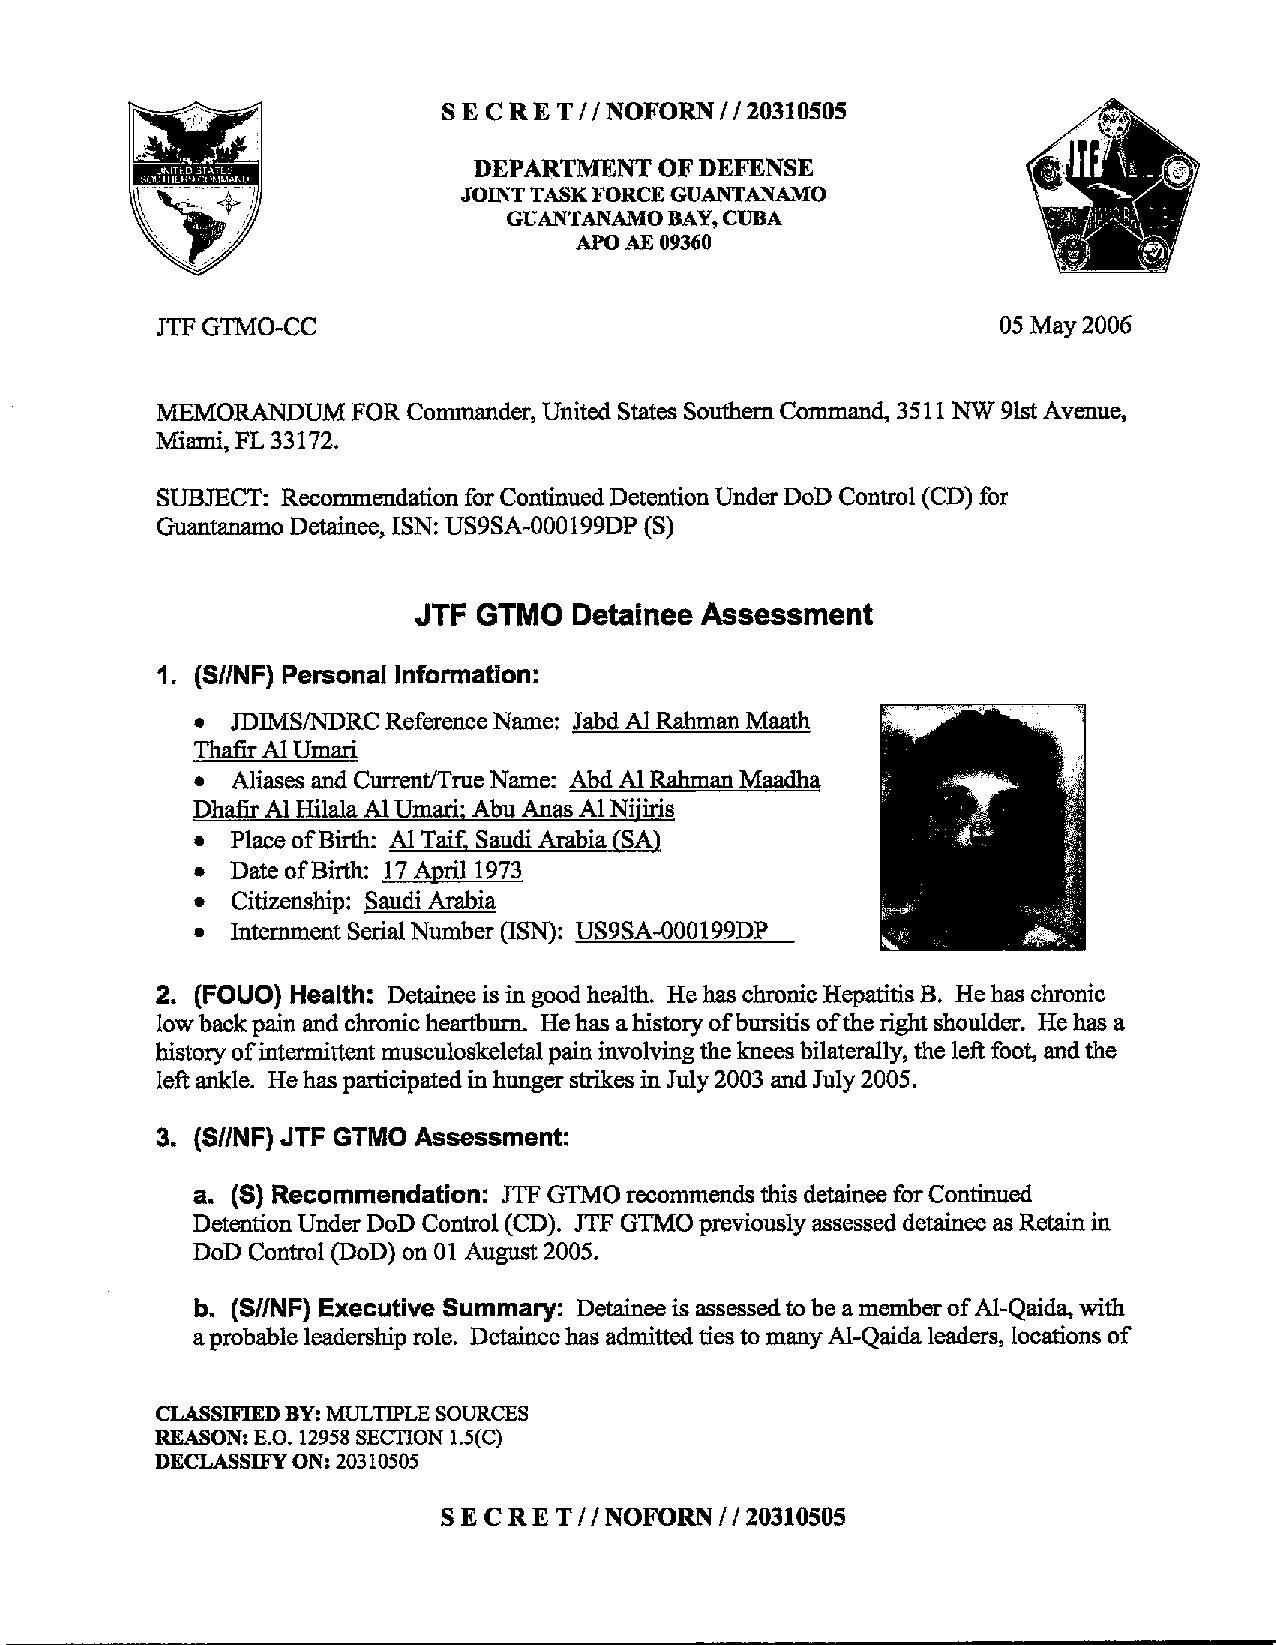 ISN 00199, Jabd Al Rahman Maath Thafir Al Umad's Guantanamo detainee assessment.pdf